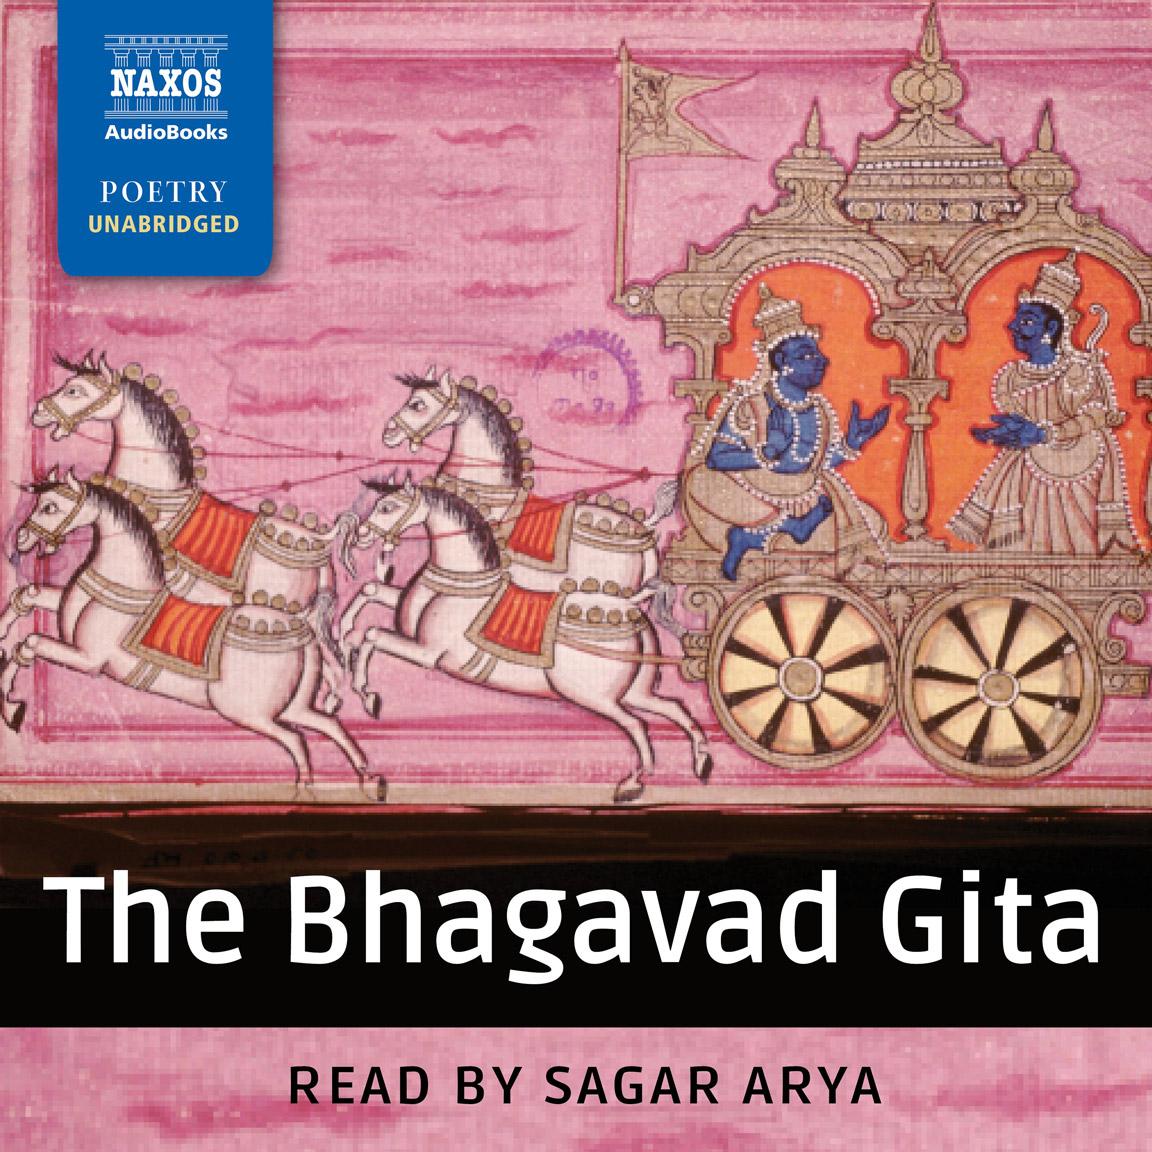 The Bhagavad Gita (unabridged)